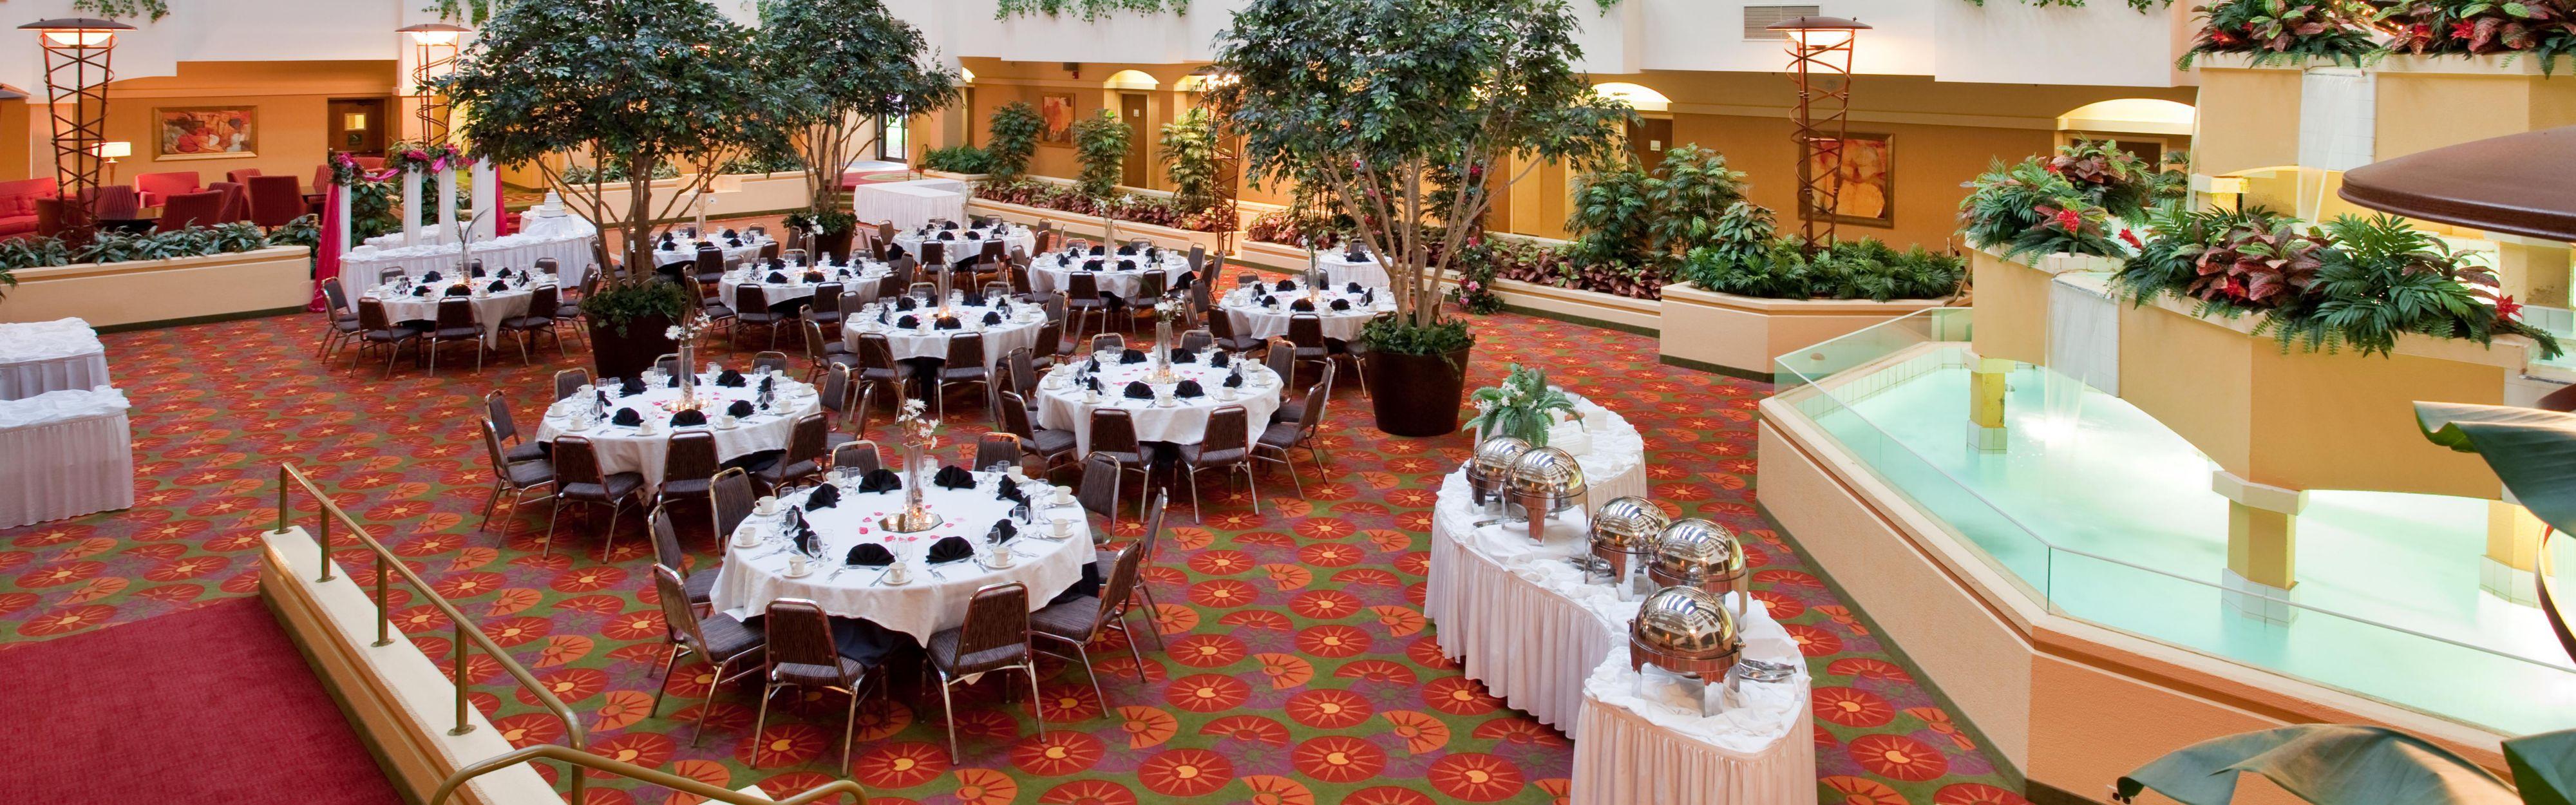 wedding reception crowne plazspringfield il%0A Holiday Inn Hotel and Suites Atrium